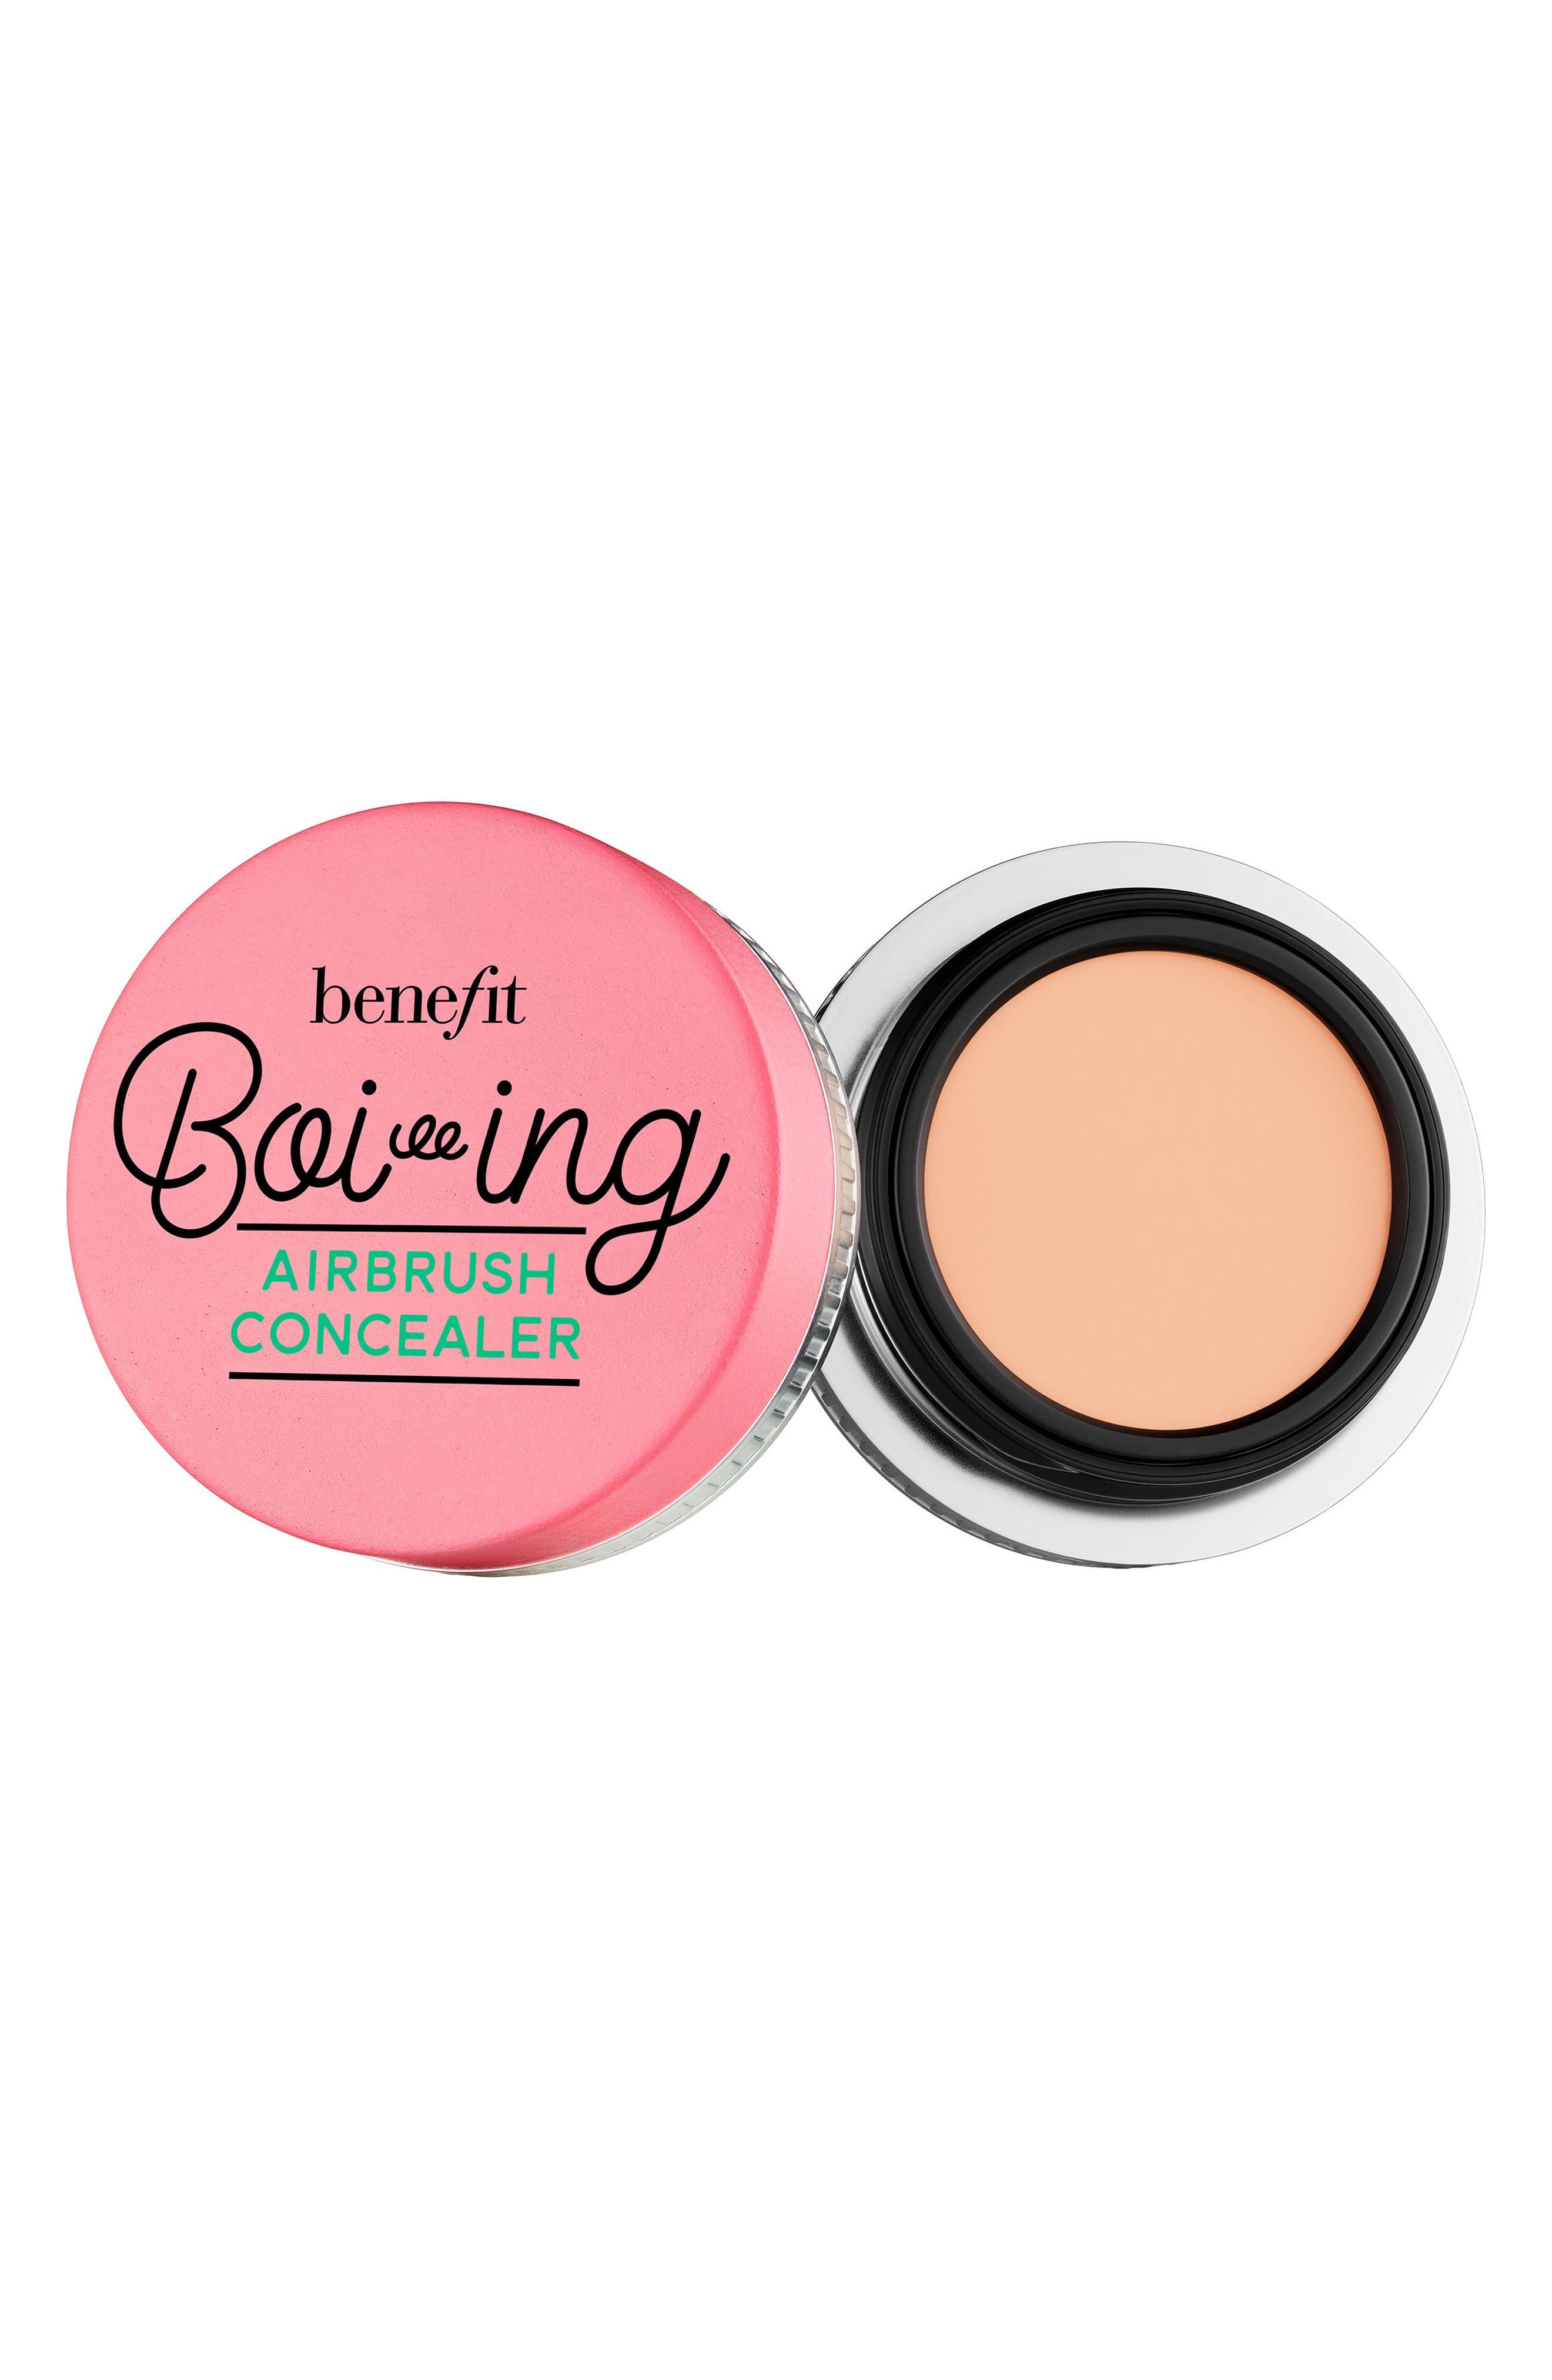 Benefit Boi-ing Airbrush Concealer,                         Main,                         color, 01 - Light